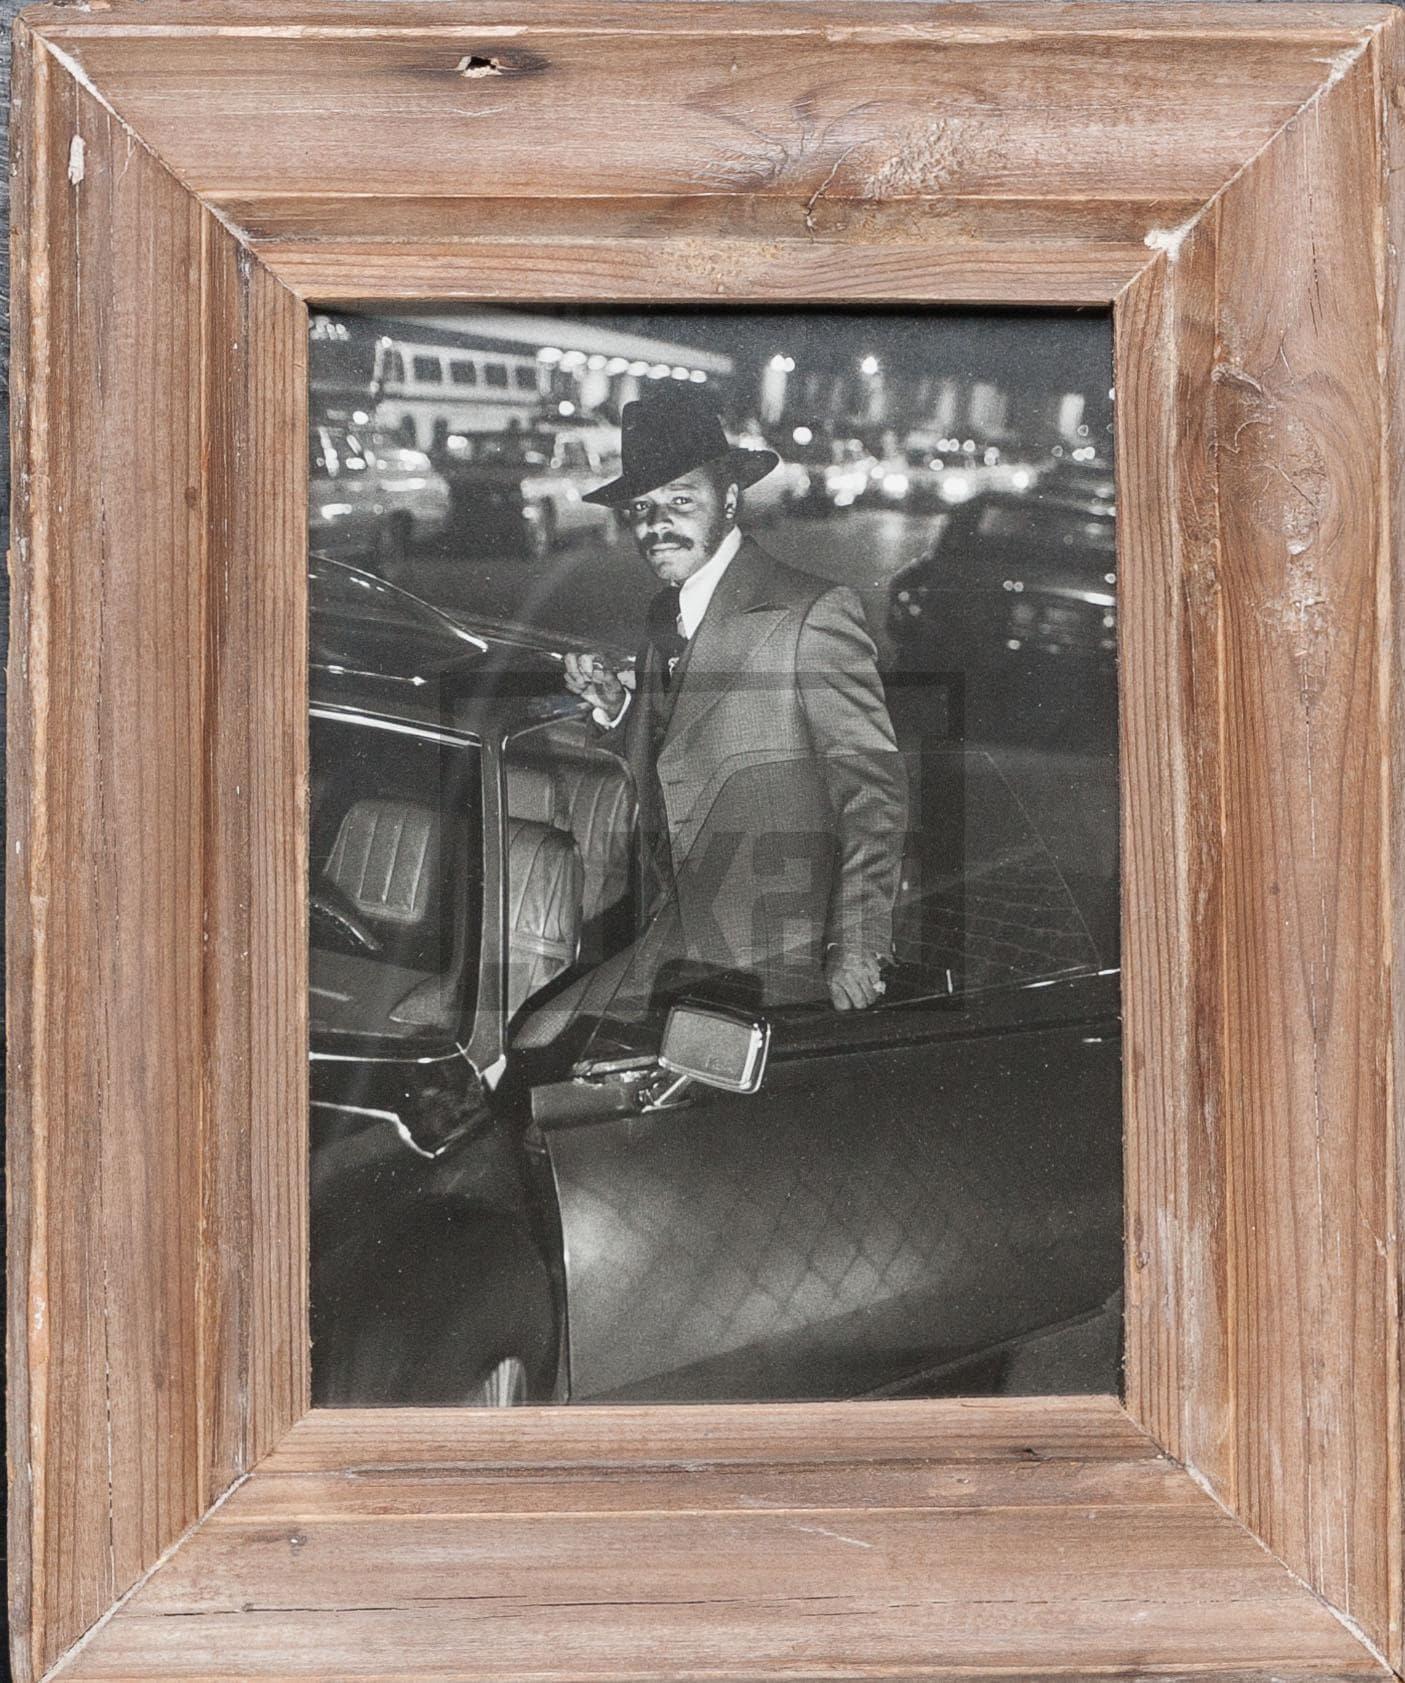 Bilderrahmen aus recyceltem Holz für Fotos 15 x 20 cm